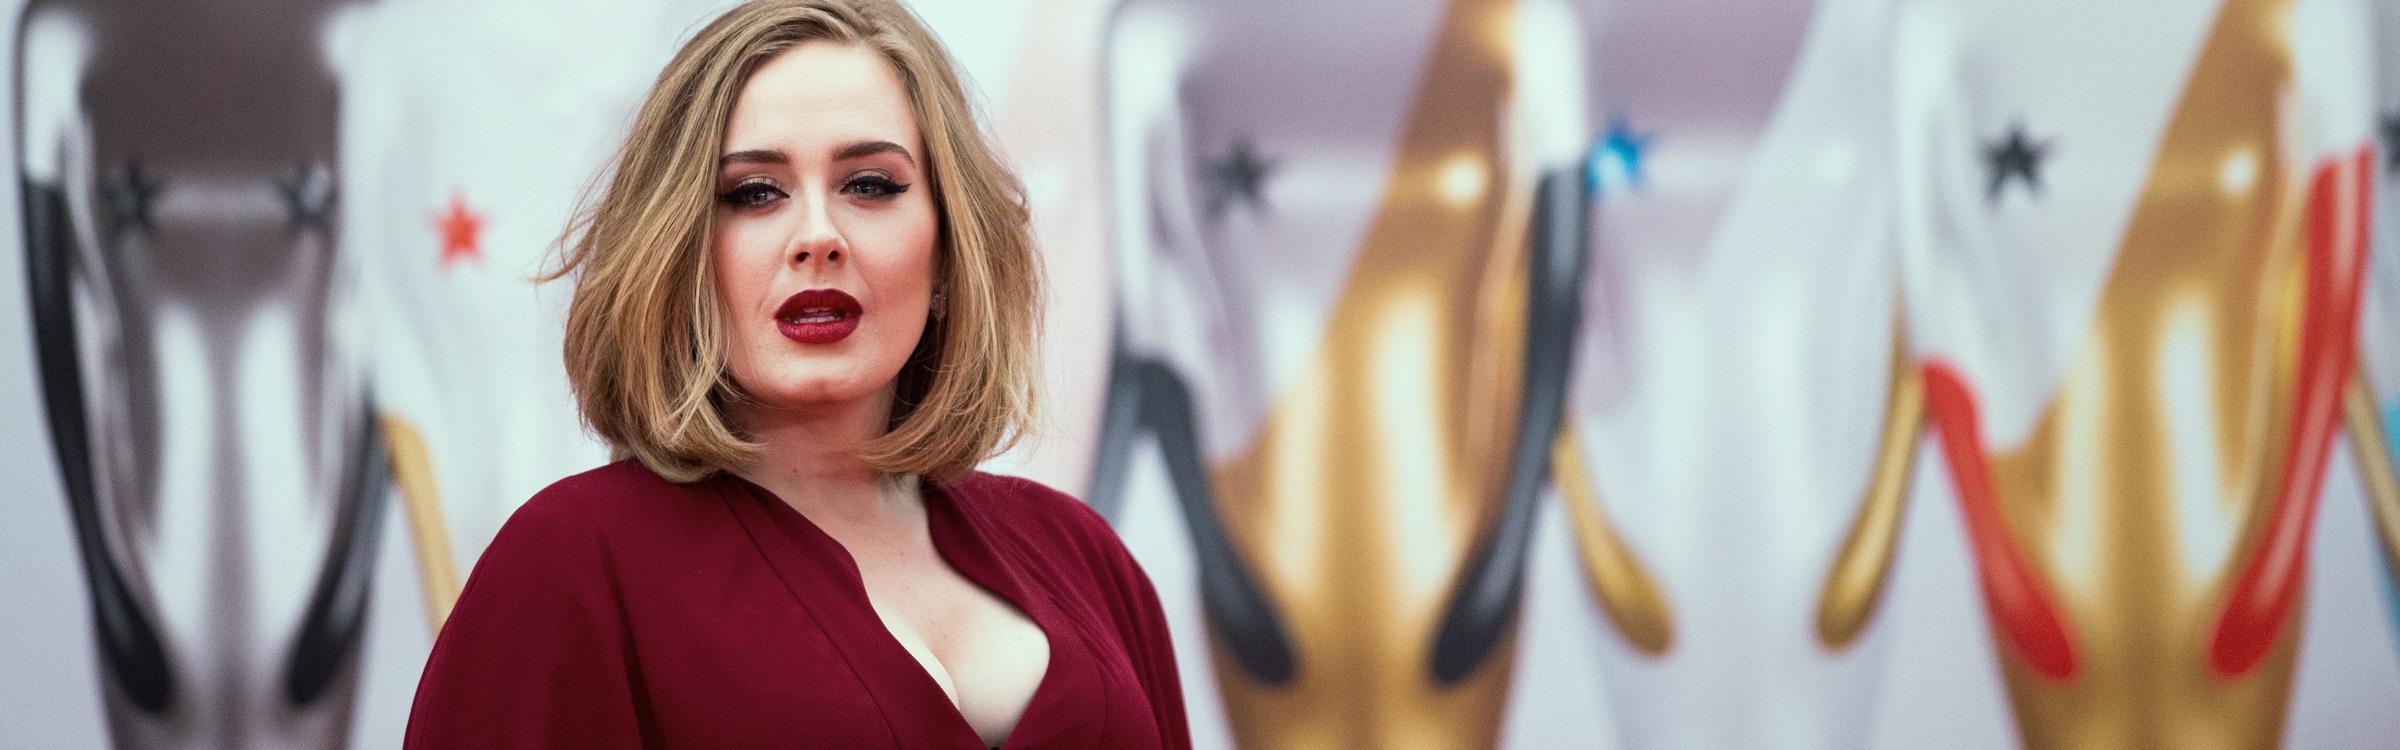 Adele 00